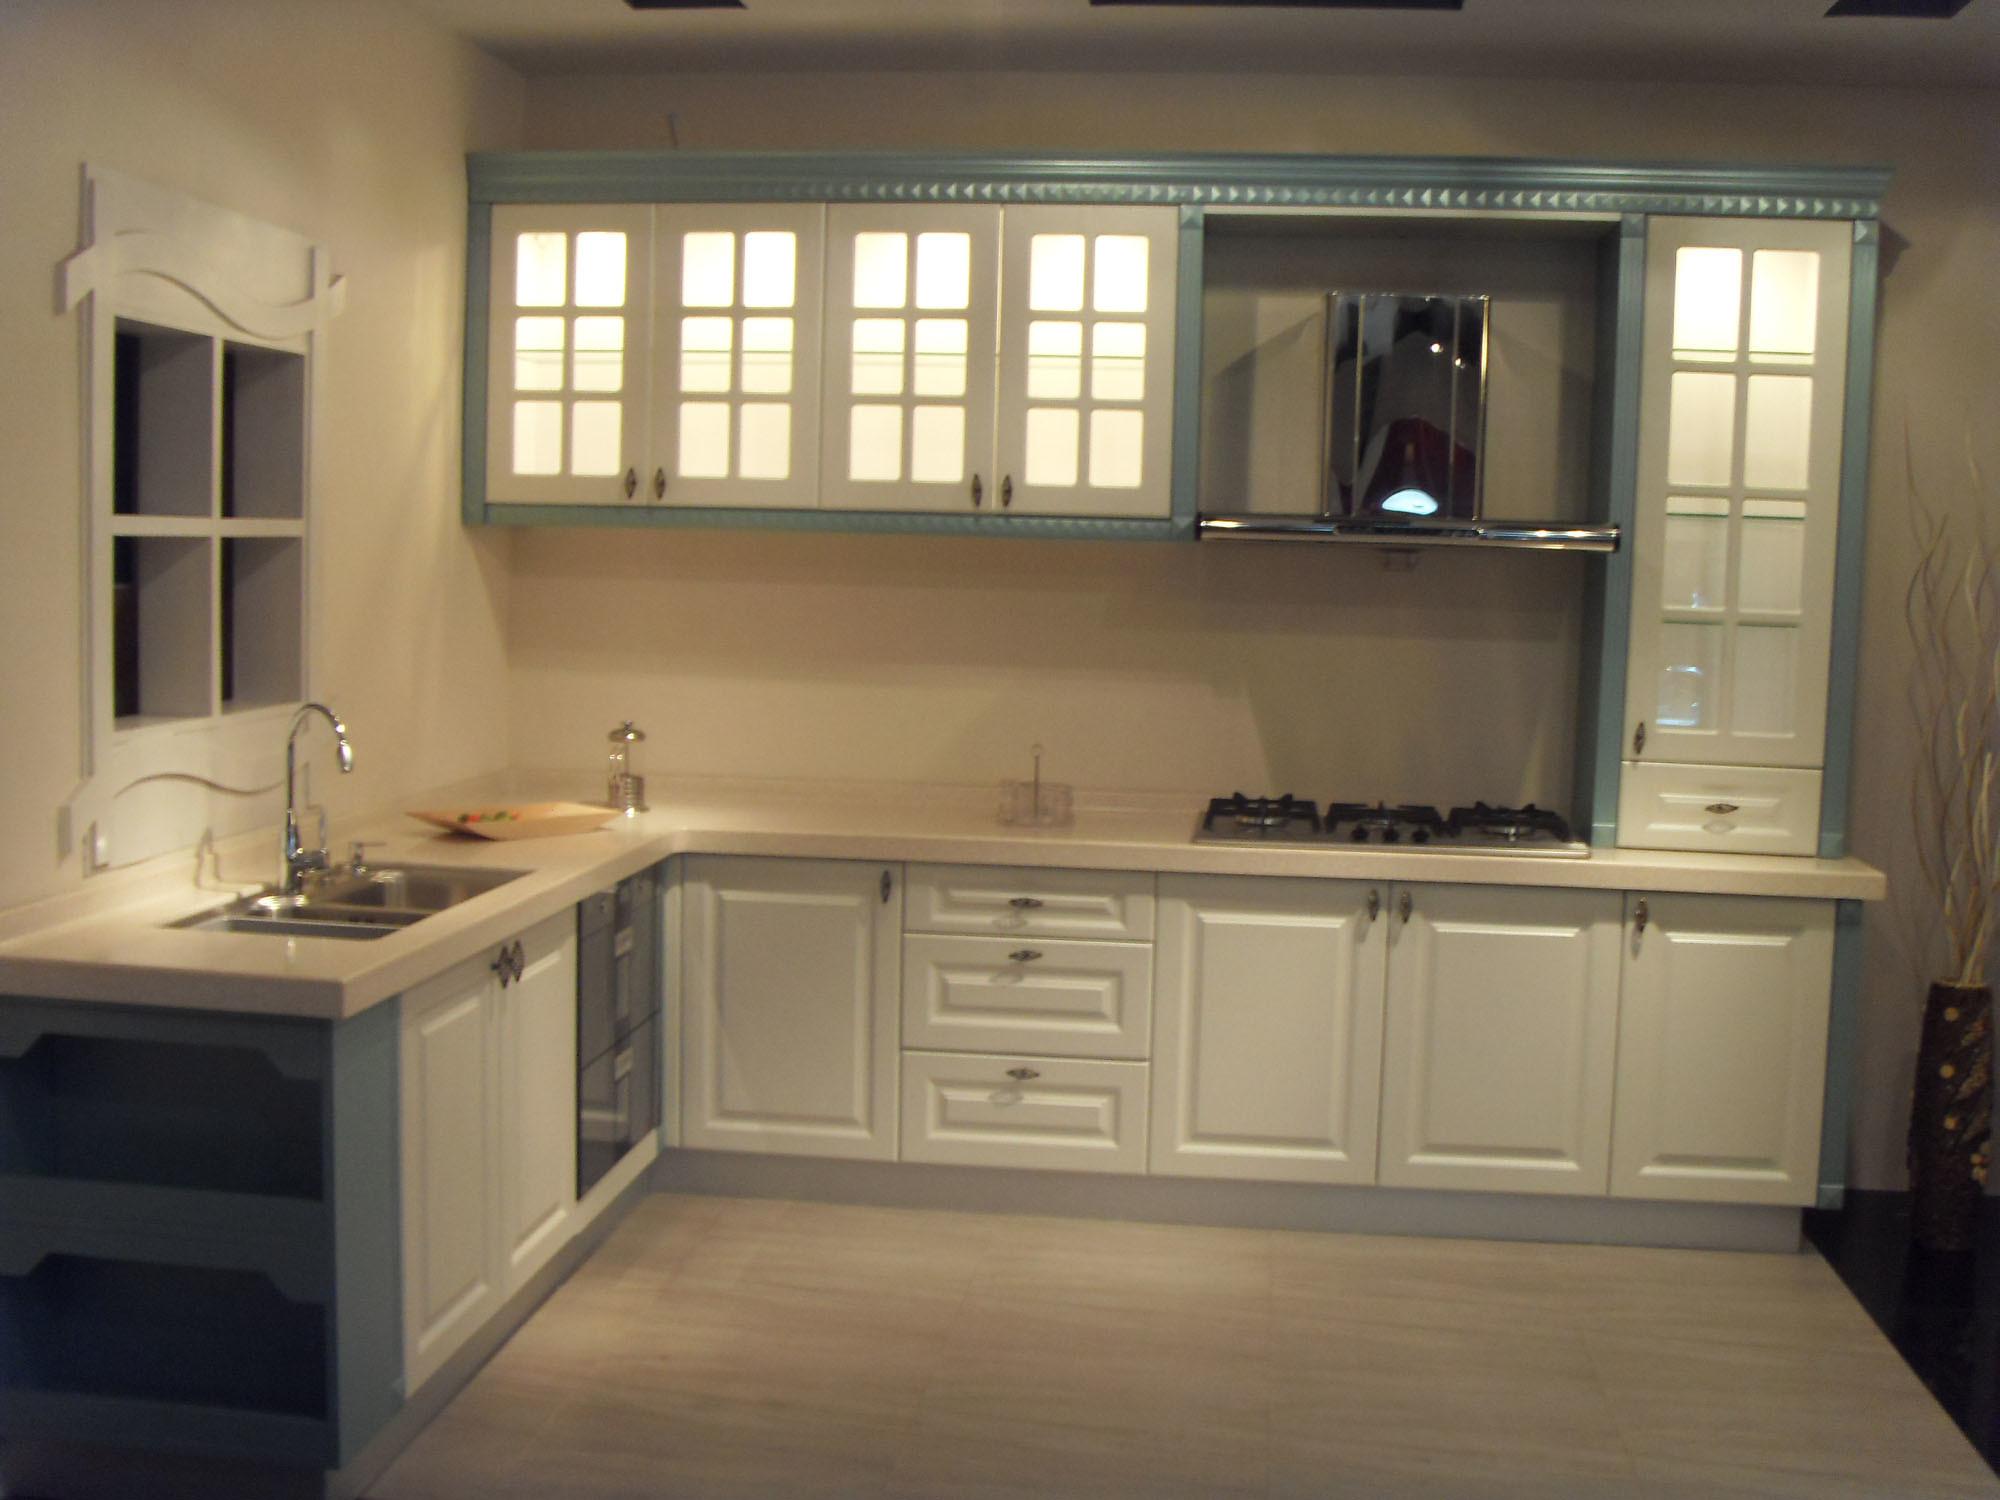 Pvc Kitchen Cabinets : China pvc kitchen cabinet dm p photos pictures